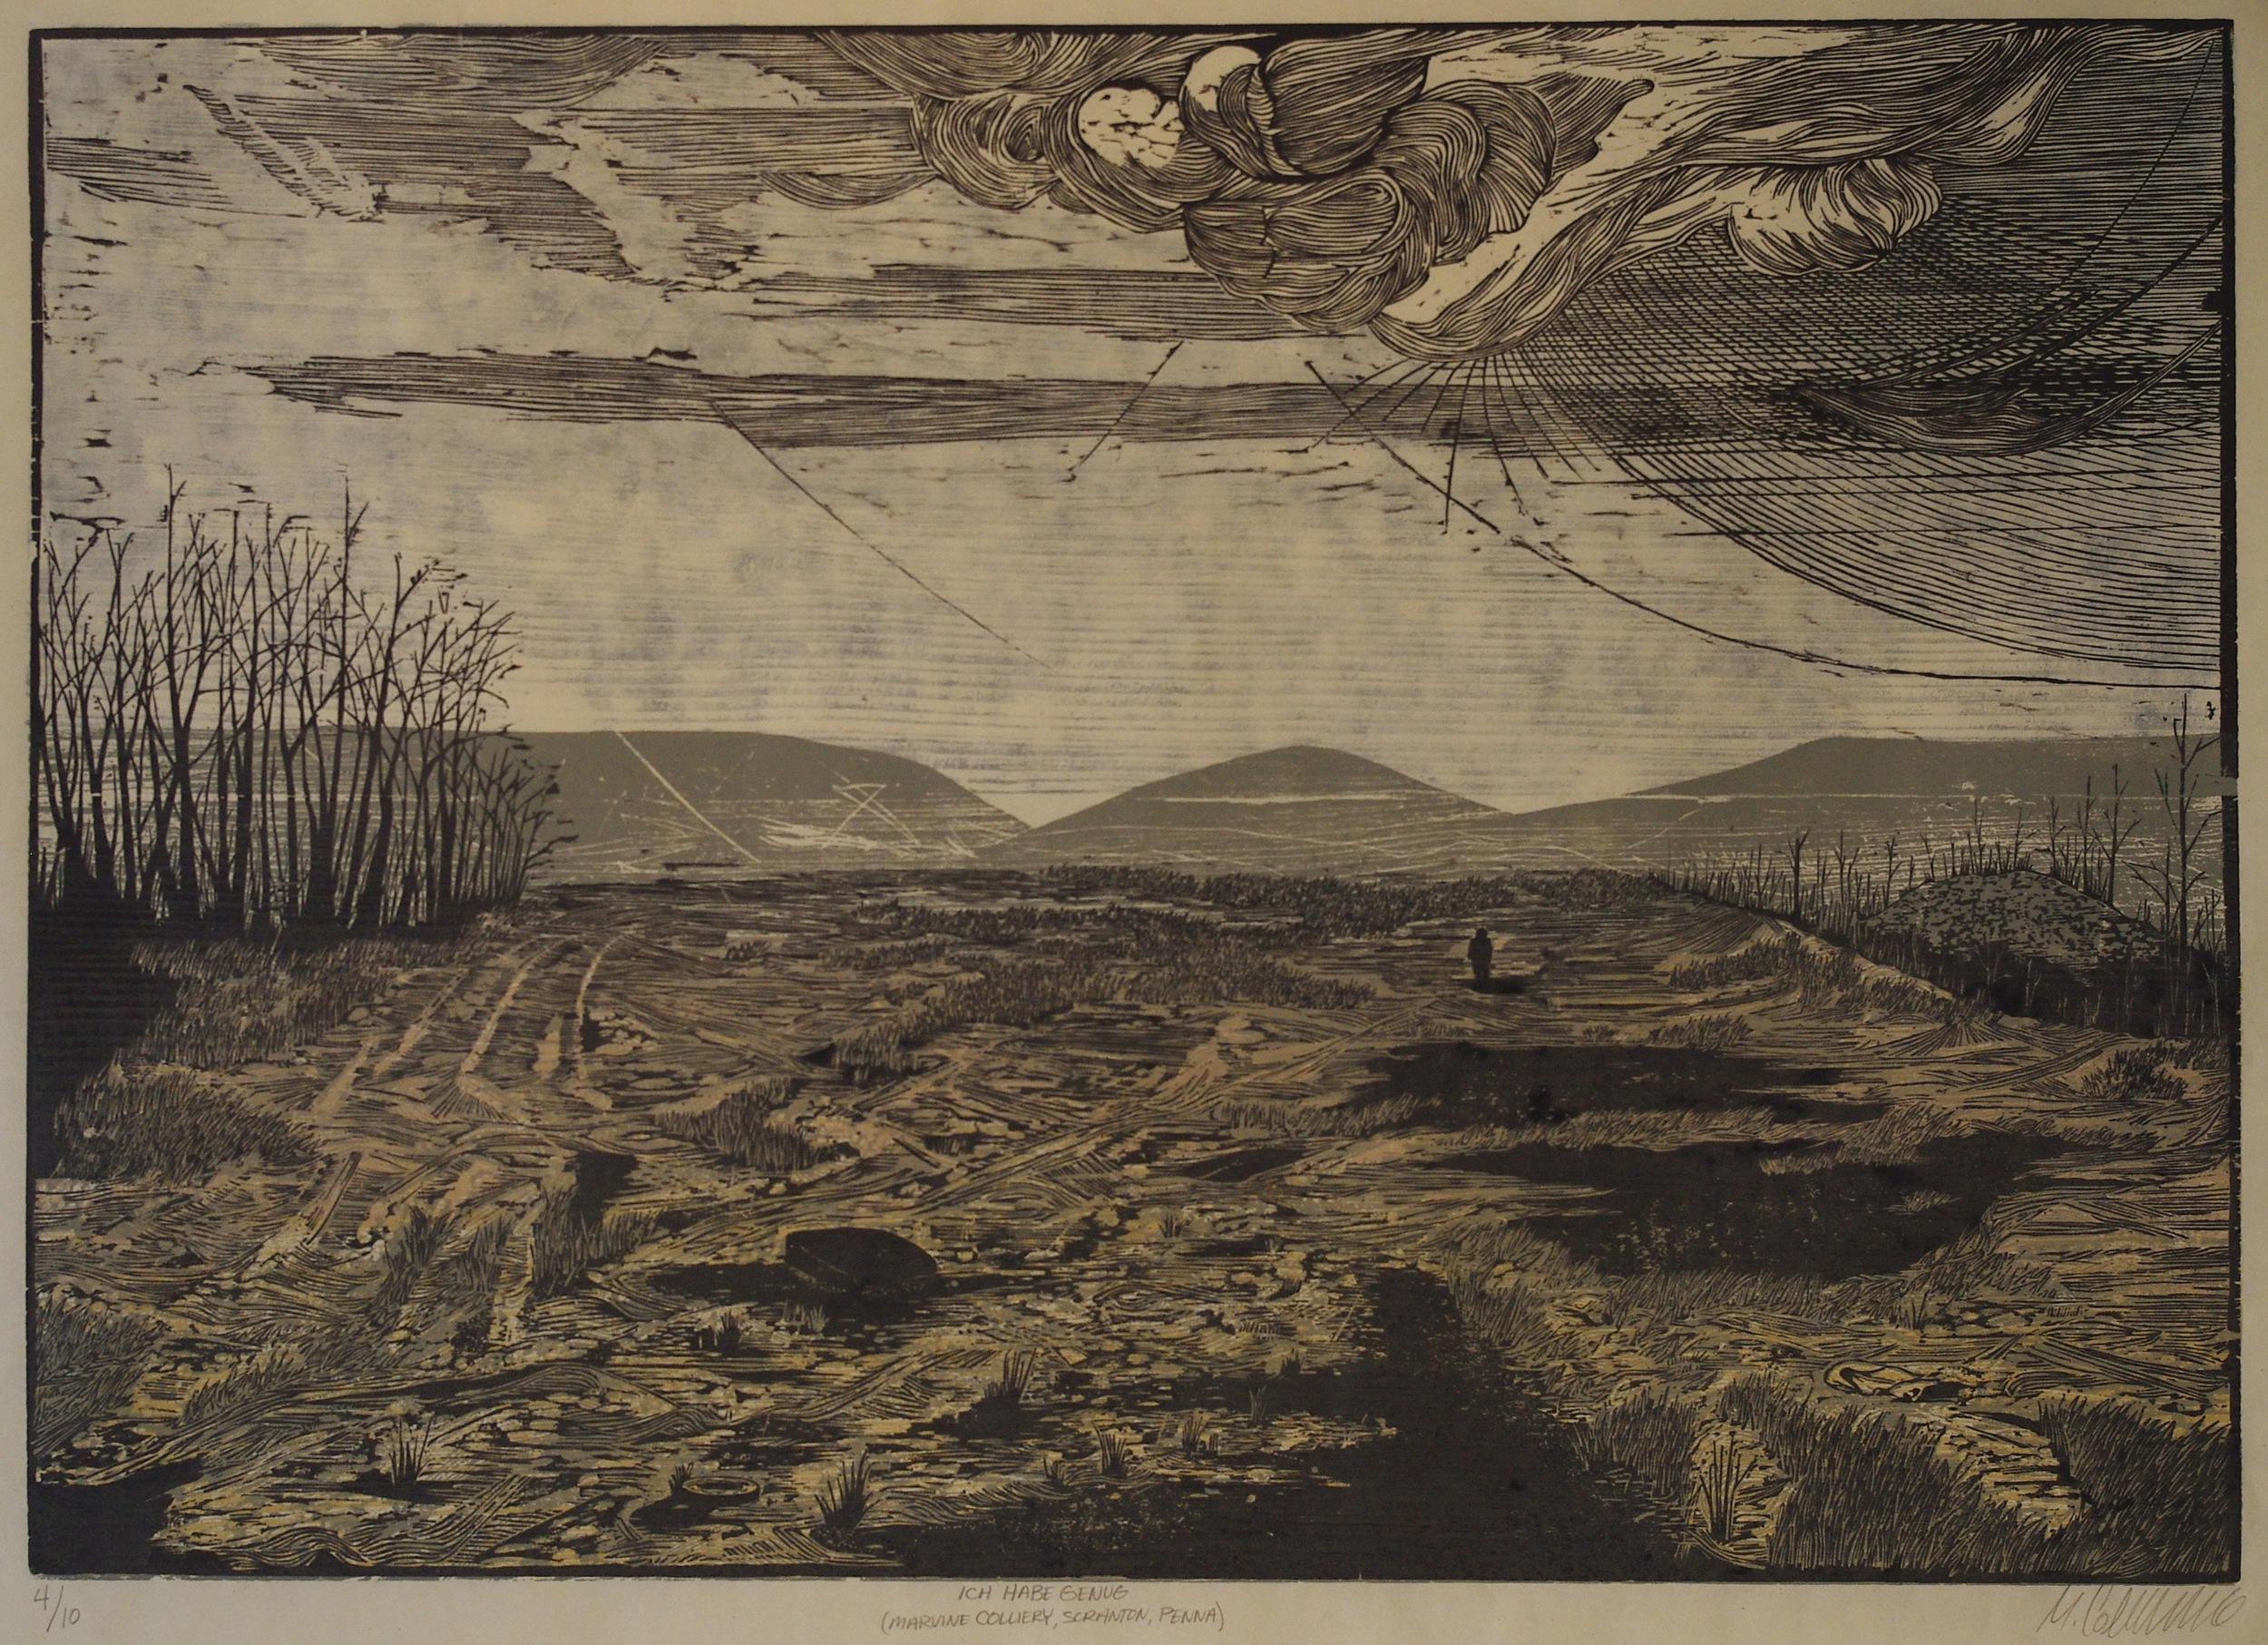 Matthew Colaizzo ,  Ich Habe Genug (Marvine Collary, Scranton, Pennsylvania)   (woodblock print on Okawara)